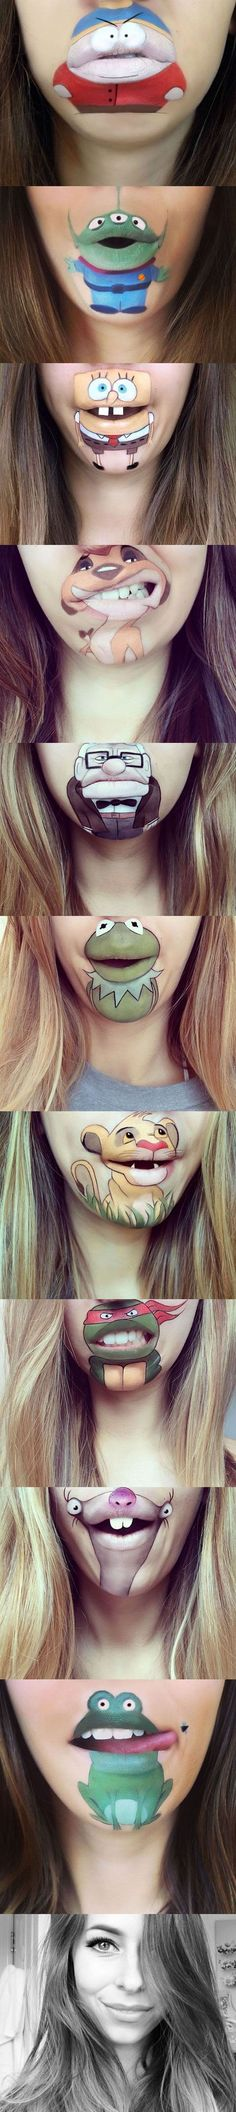 Pinterest: @ ndeyepins – Awesome Lip Makeup